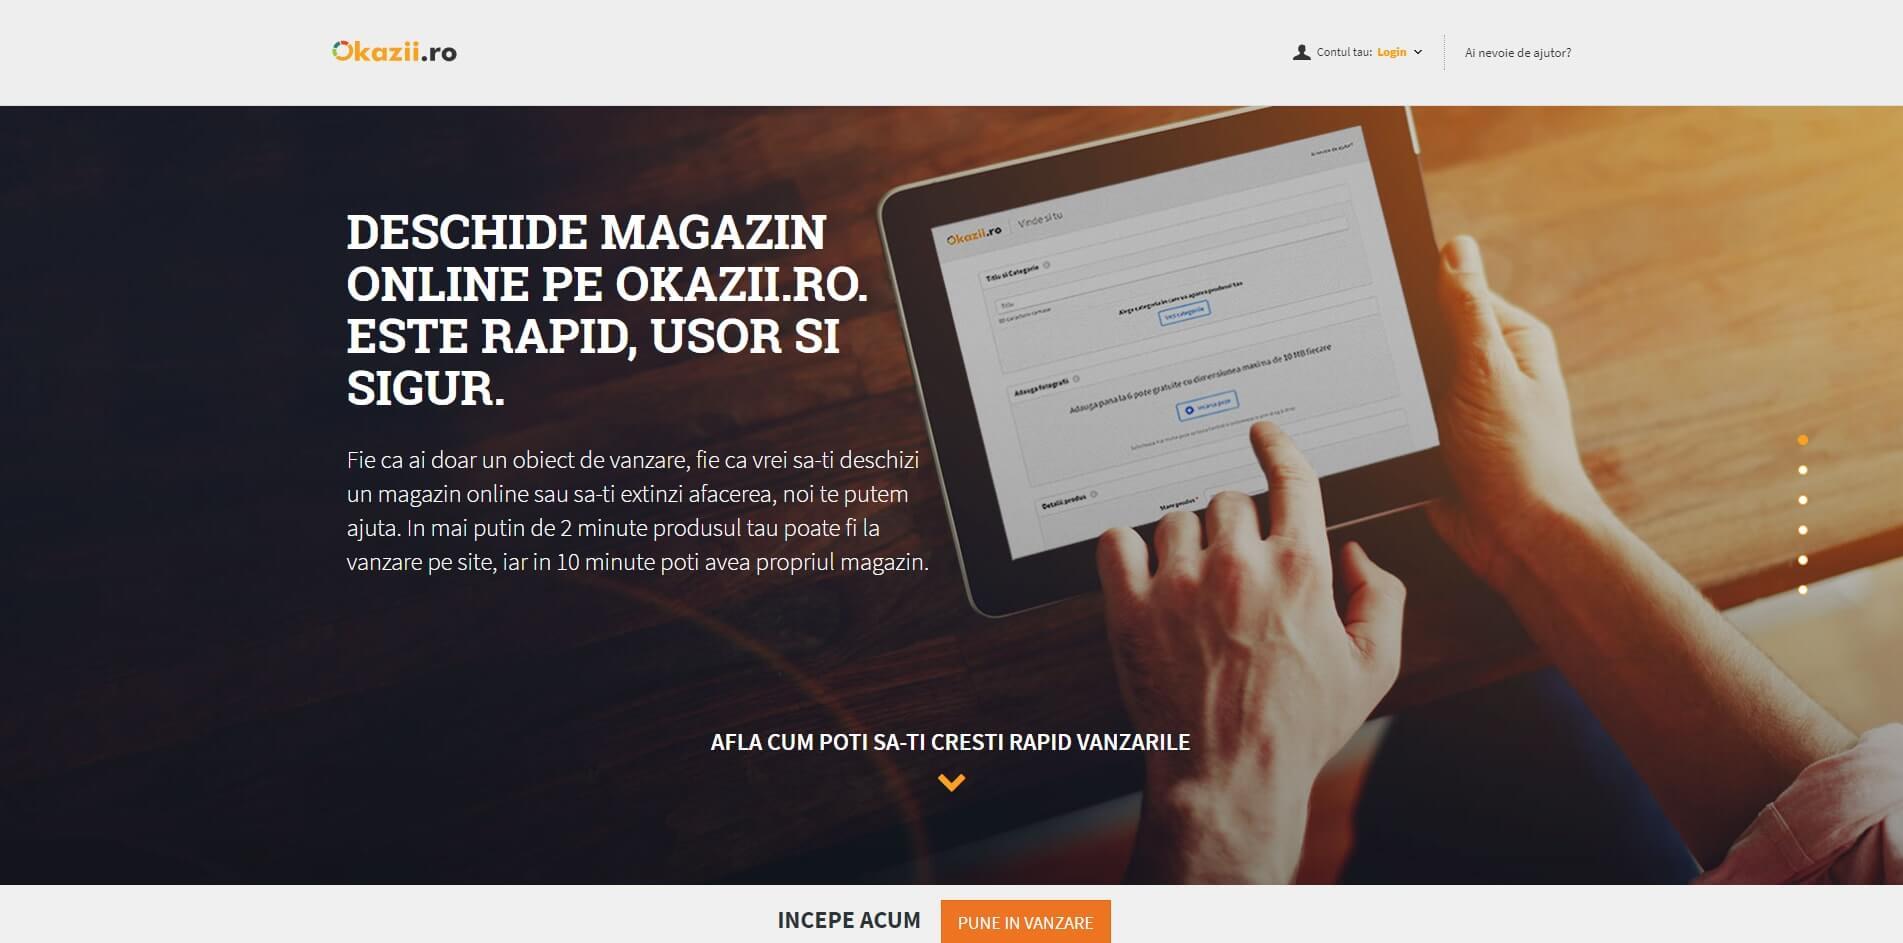 Deschide ti un magazin online pe Okazii.ro